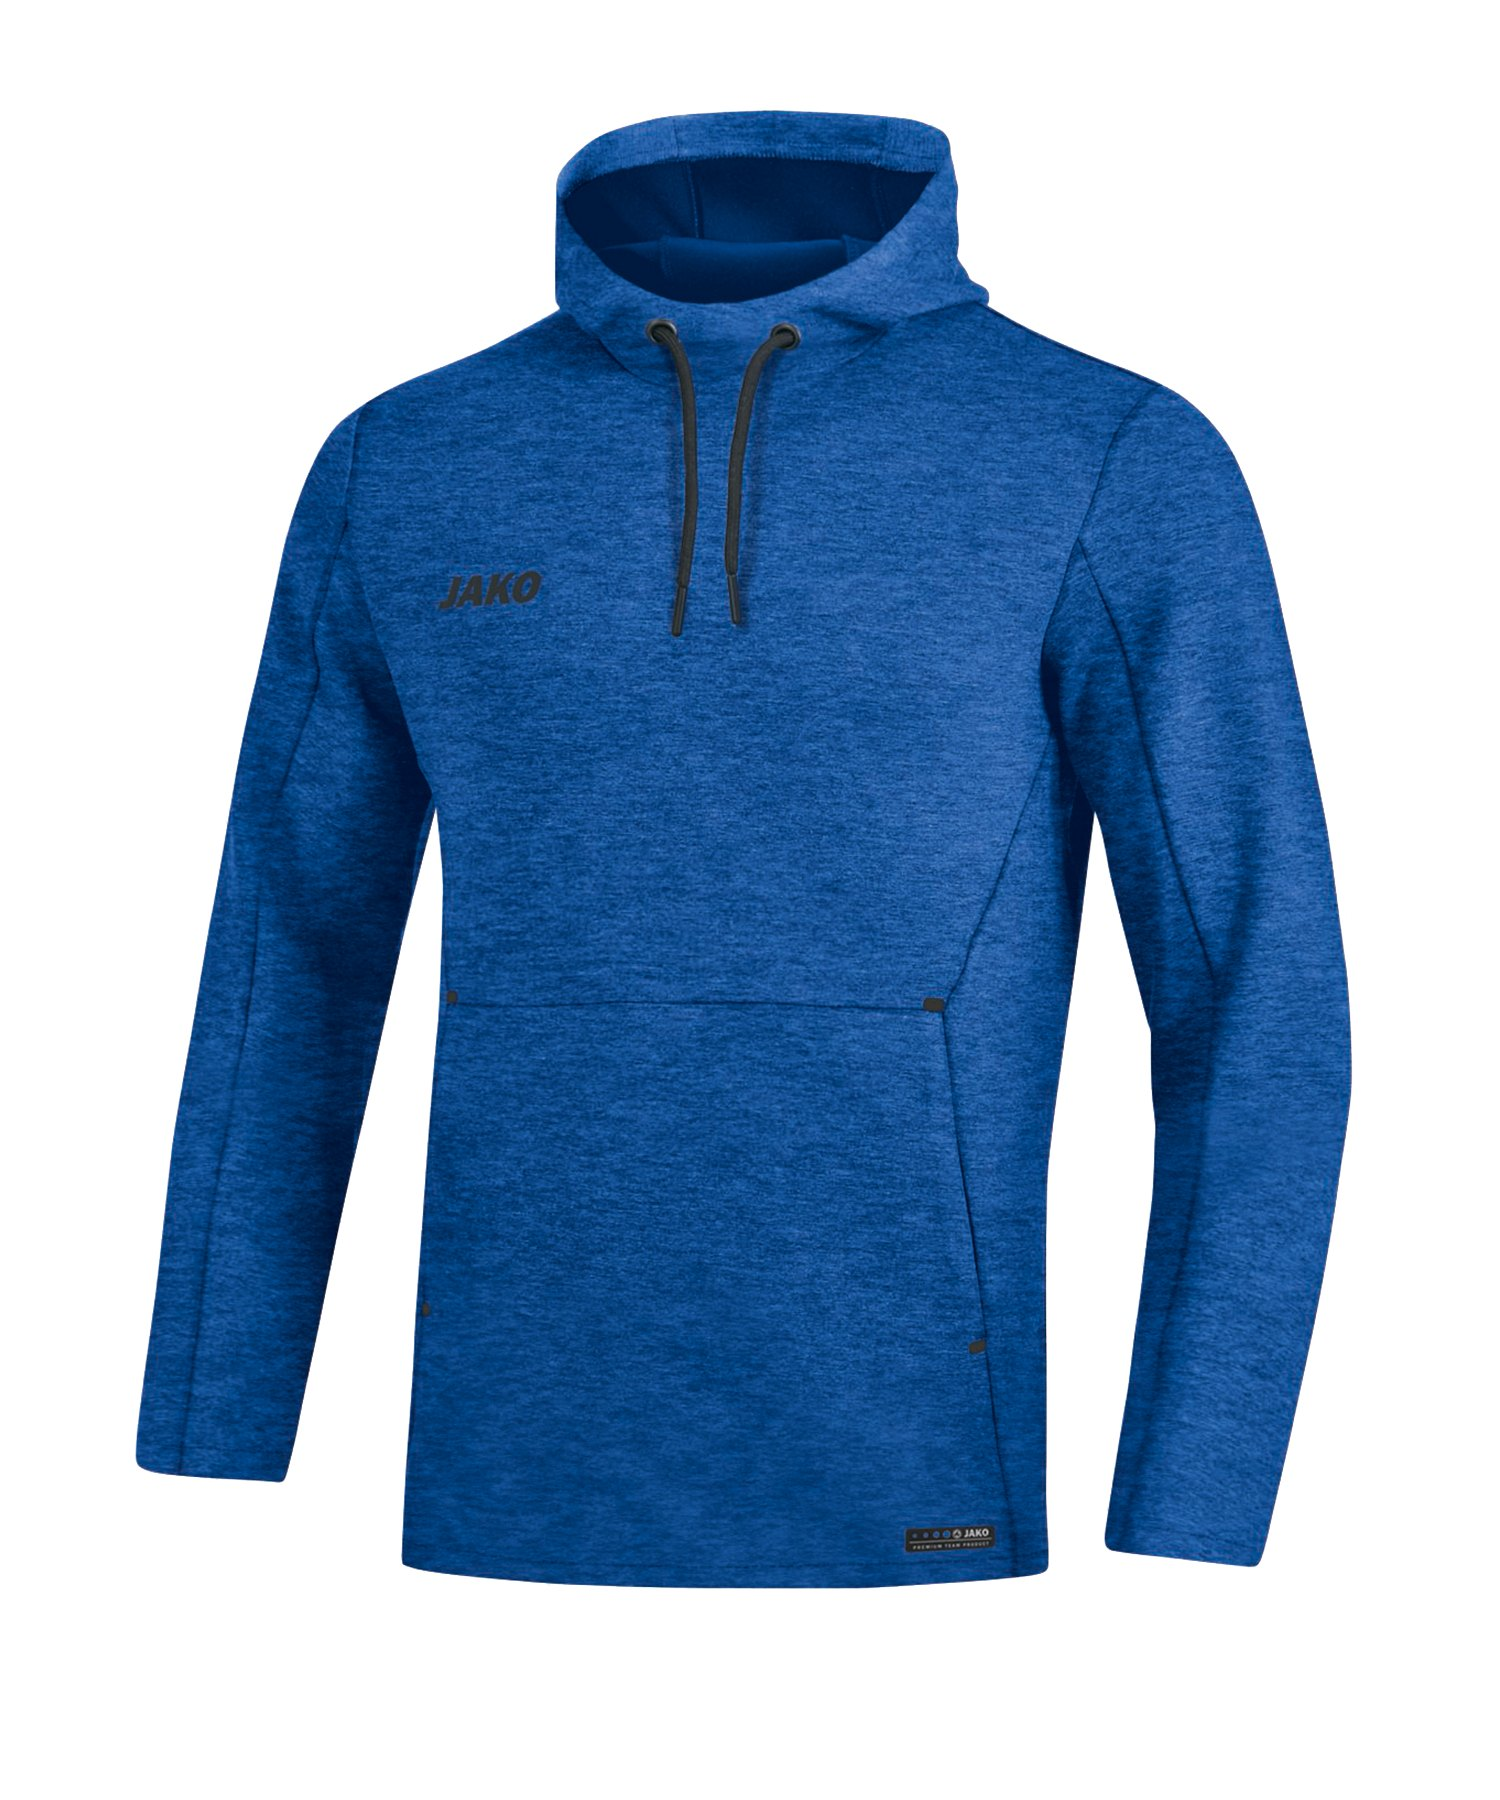 Jako Premium Basic Hoody Damen Blau F04 - blau